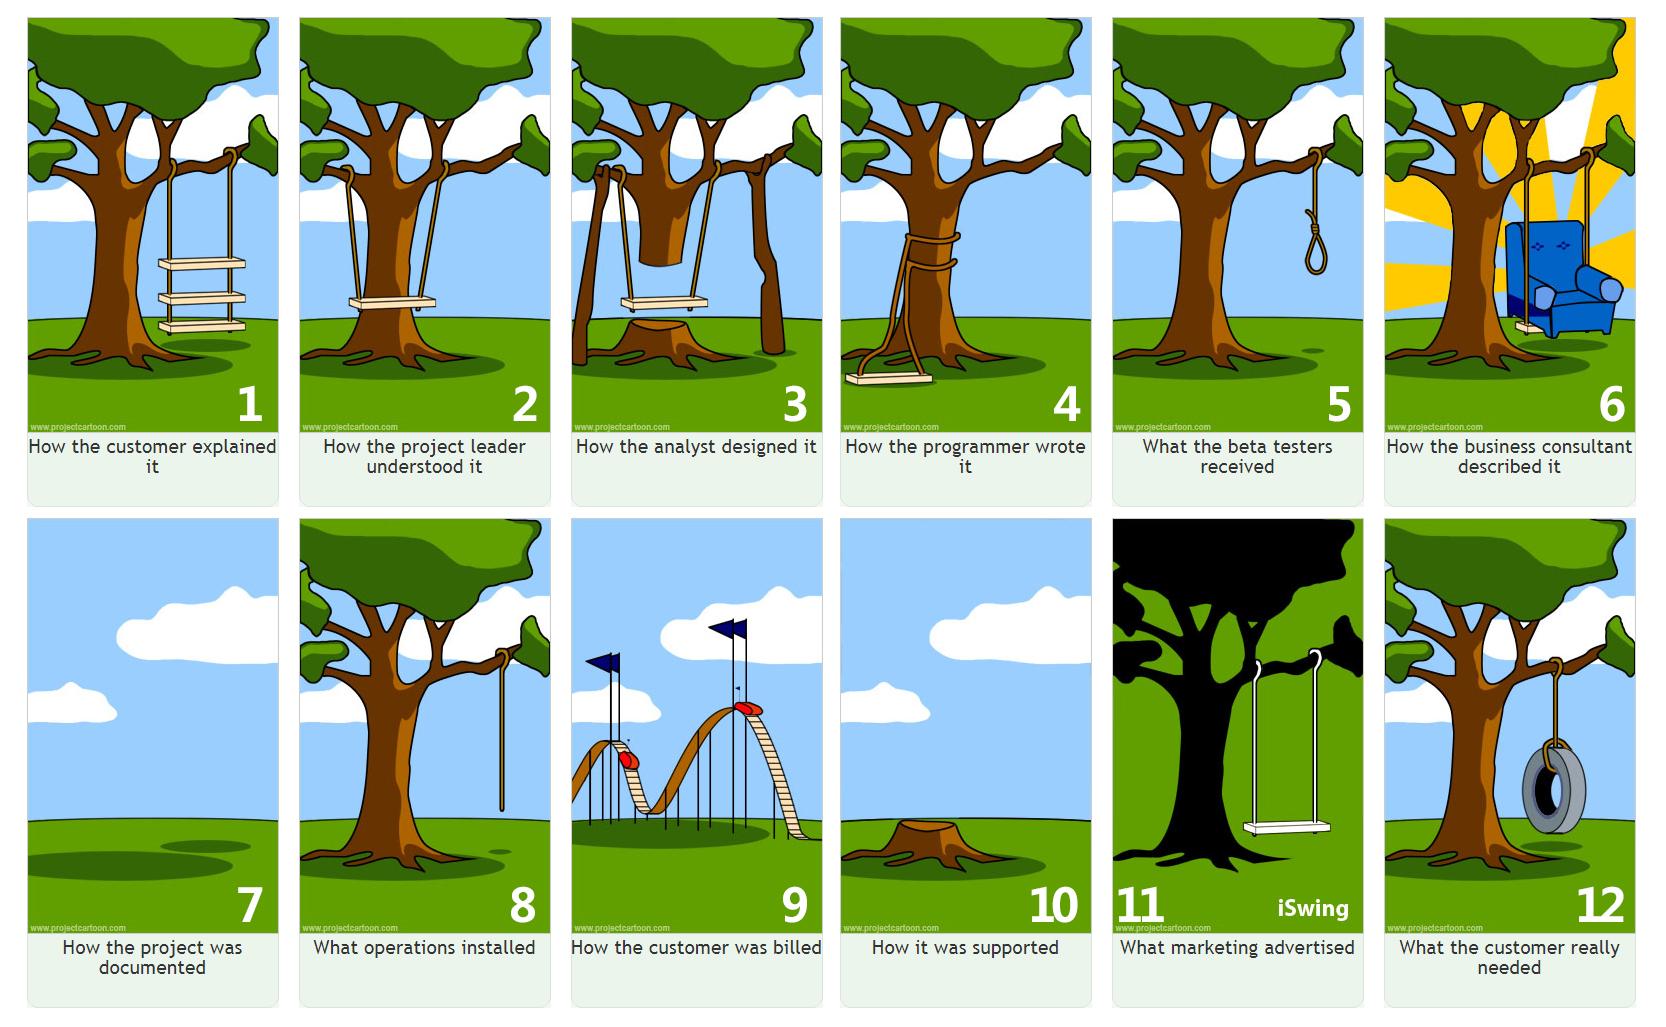 treeswingstory.jpg